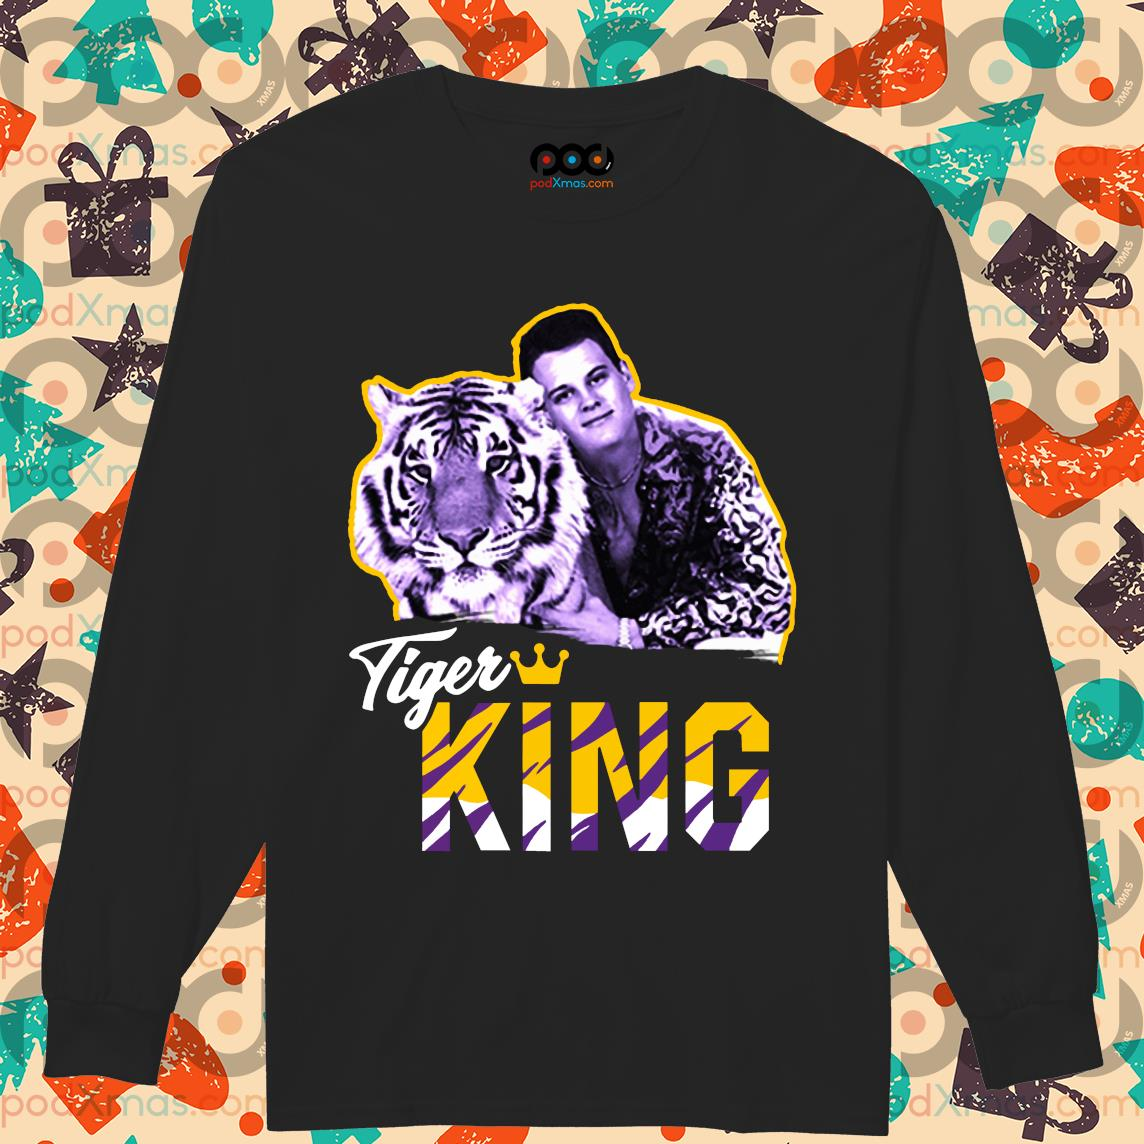 Tiger King T-Shirt Longsleeved PODxmas den